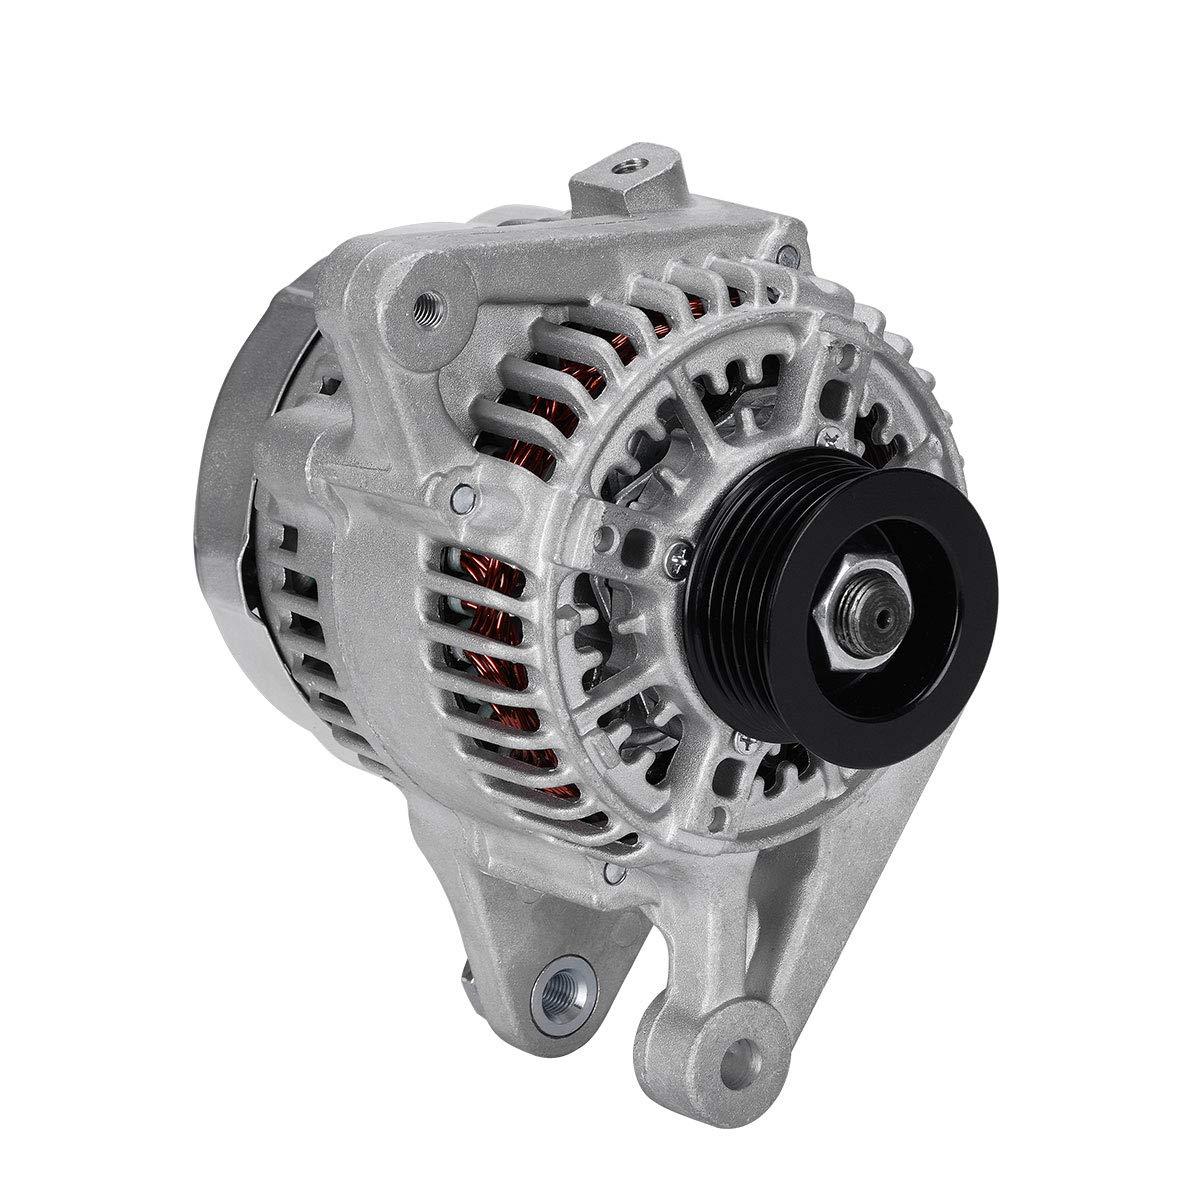 YITAMOTOR New Alternator Compatible for Toyota Corolla, Chevrolet Prizm 1.8L L4 1998-2002, 13756 101211-9960 27060-0D010 94857218 3211891